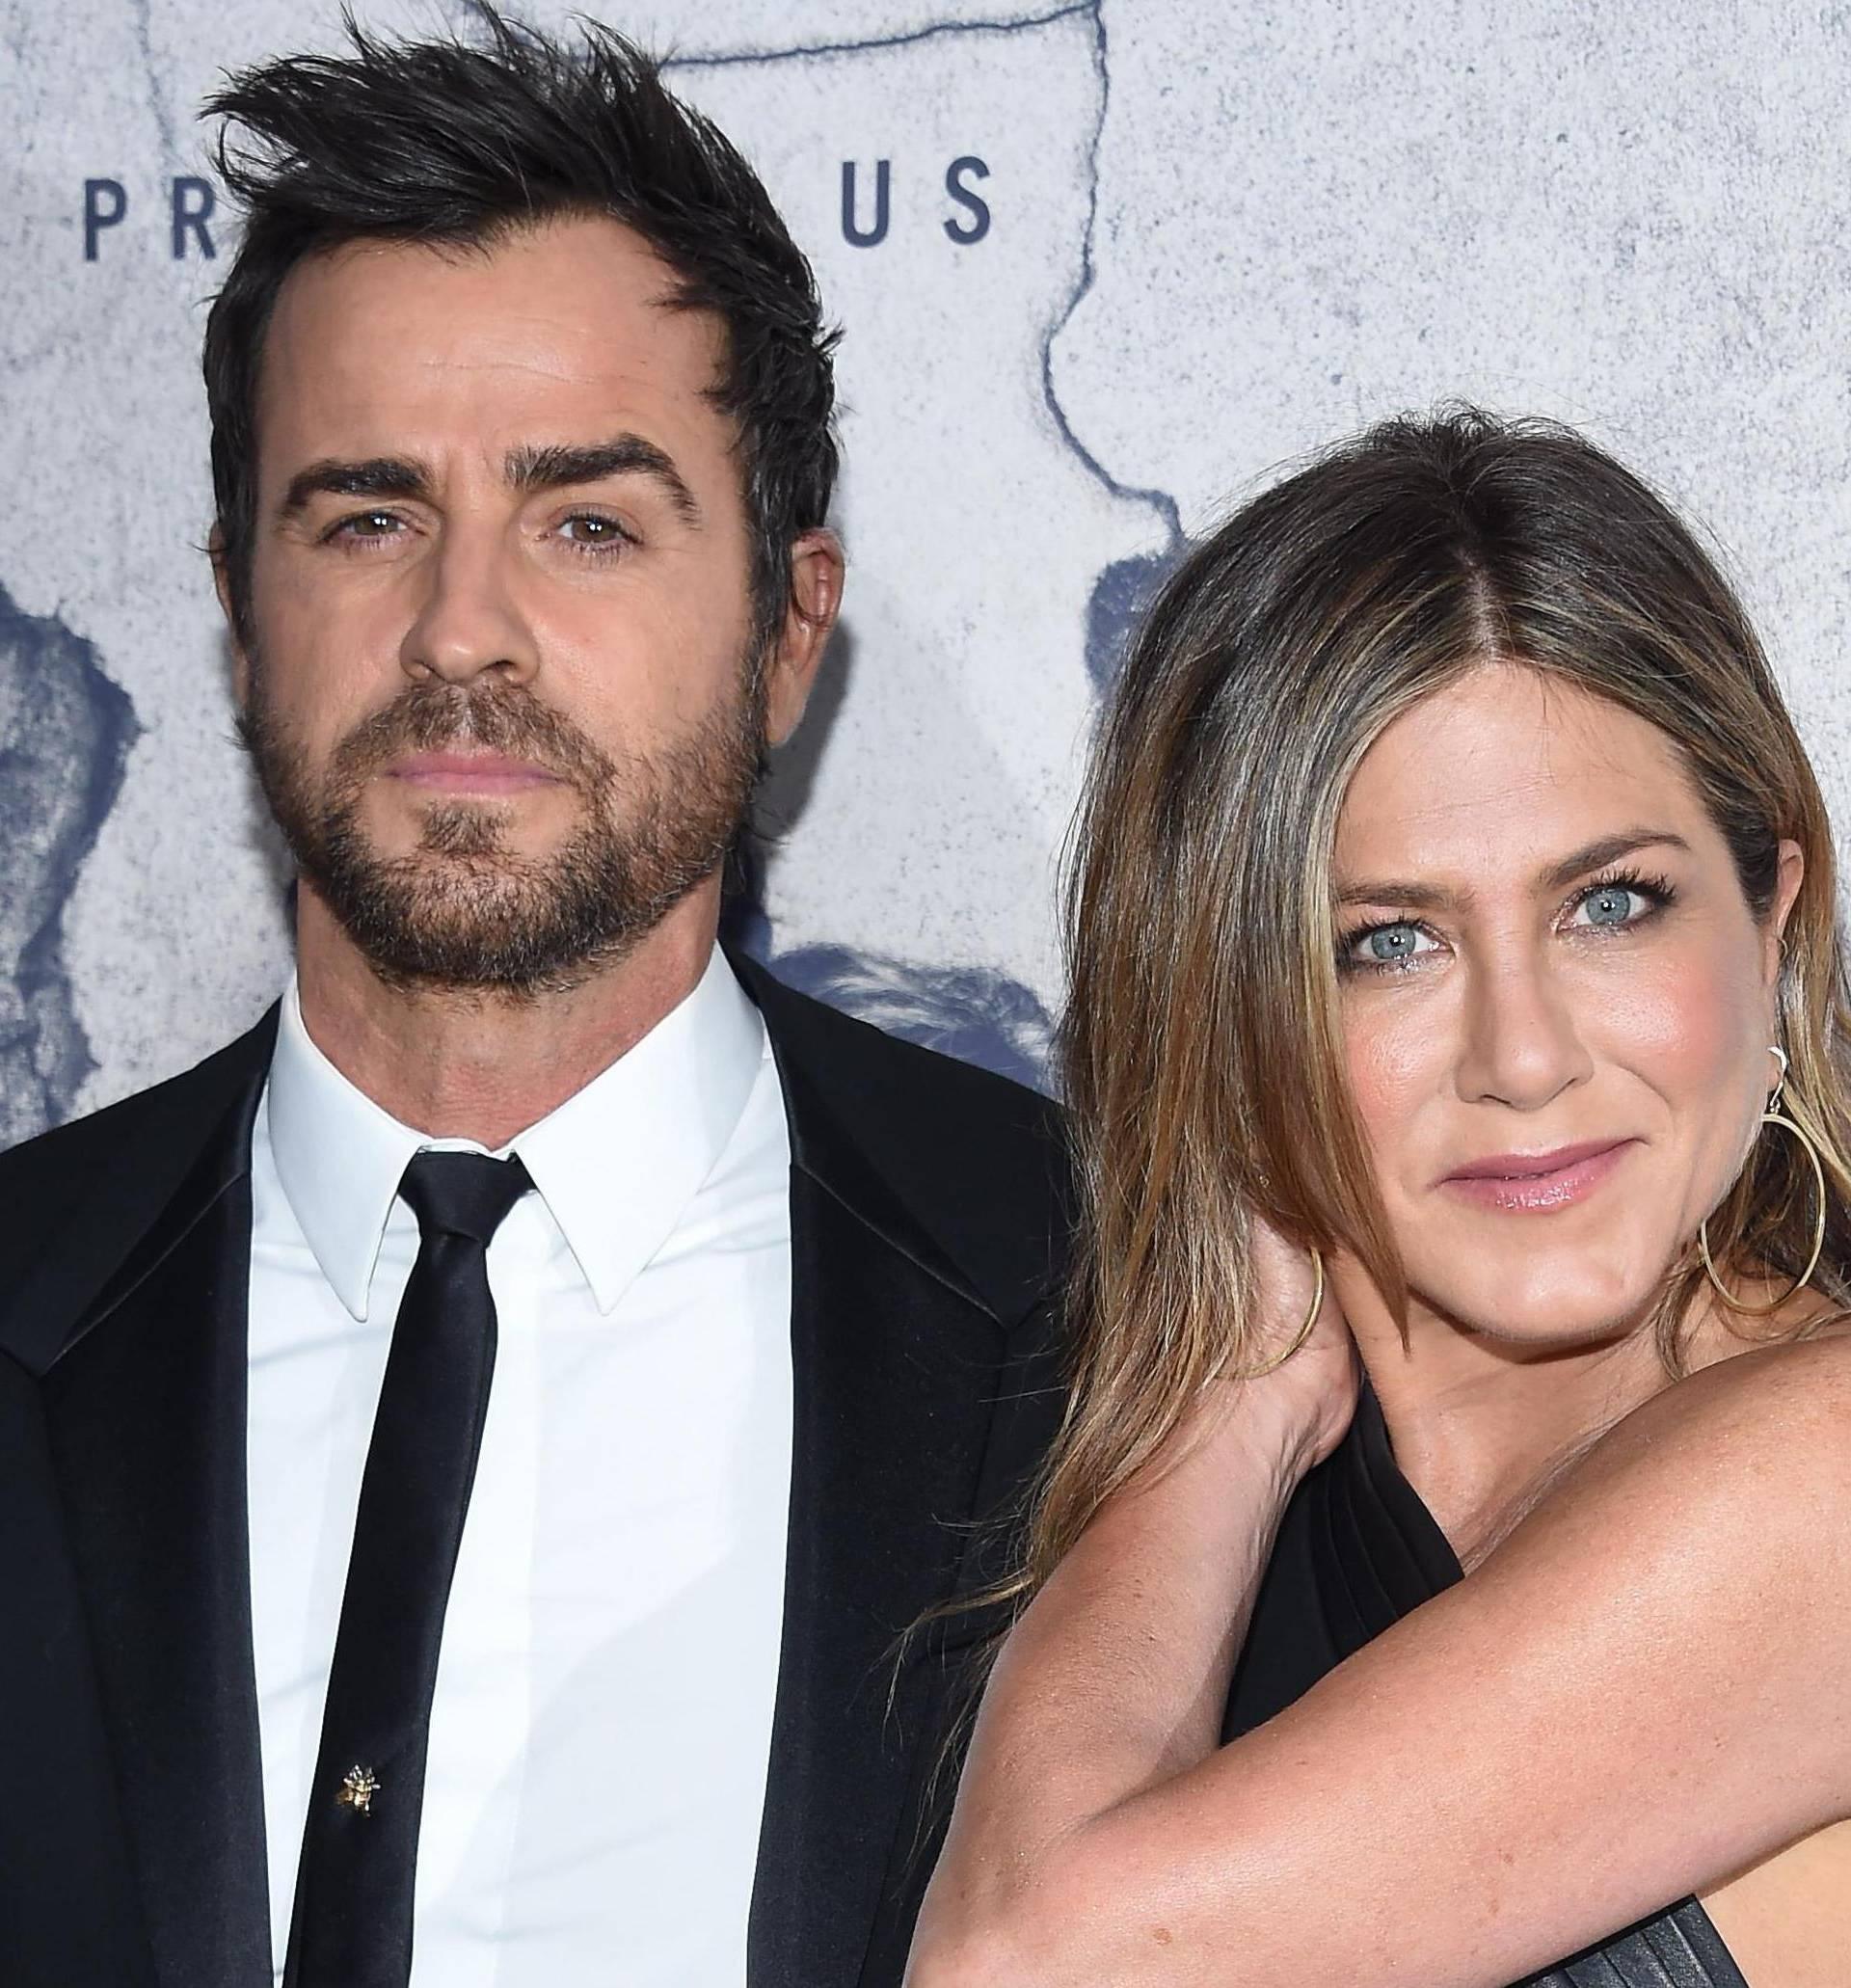 HBO's ''The Leftovers'' Season 3 Premiere - Los Angeles